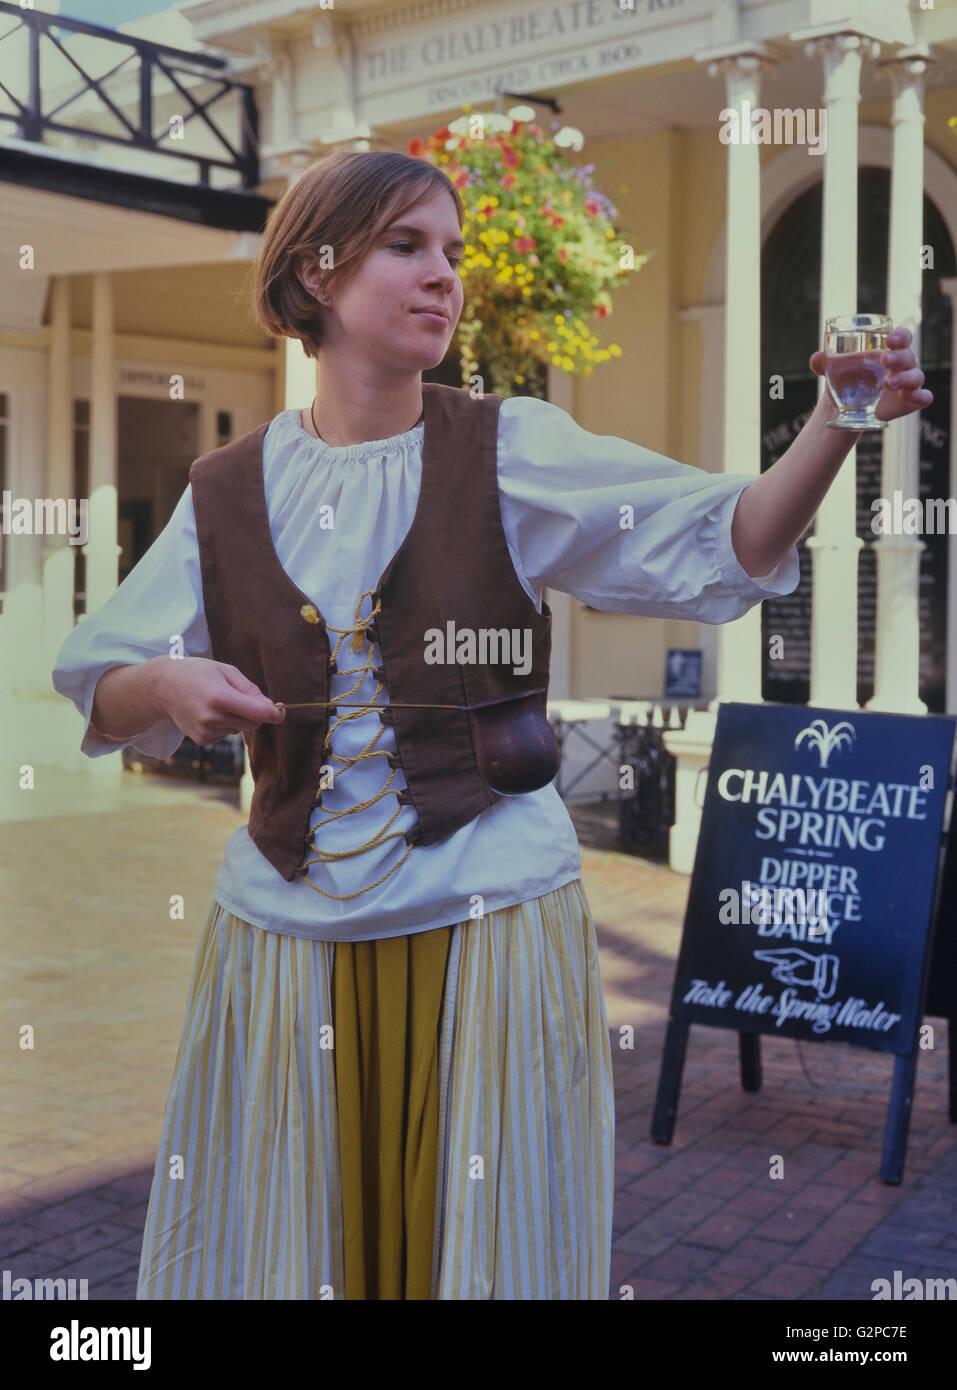 Costumed dipper at the Chalybeate Spring. The Pantiles. Royal Tunbridge Wells. Kent. UK. Europe - Stock Image